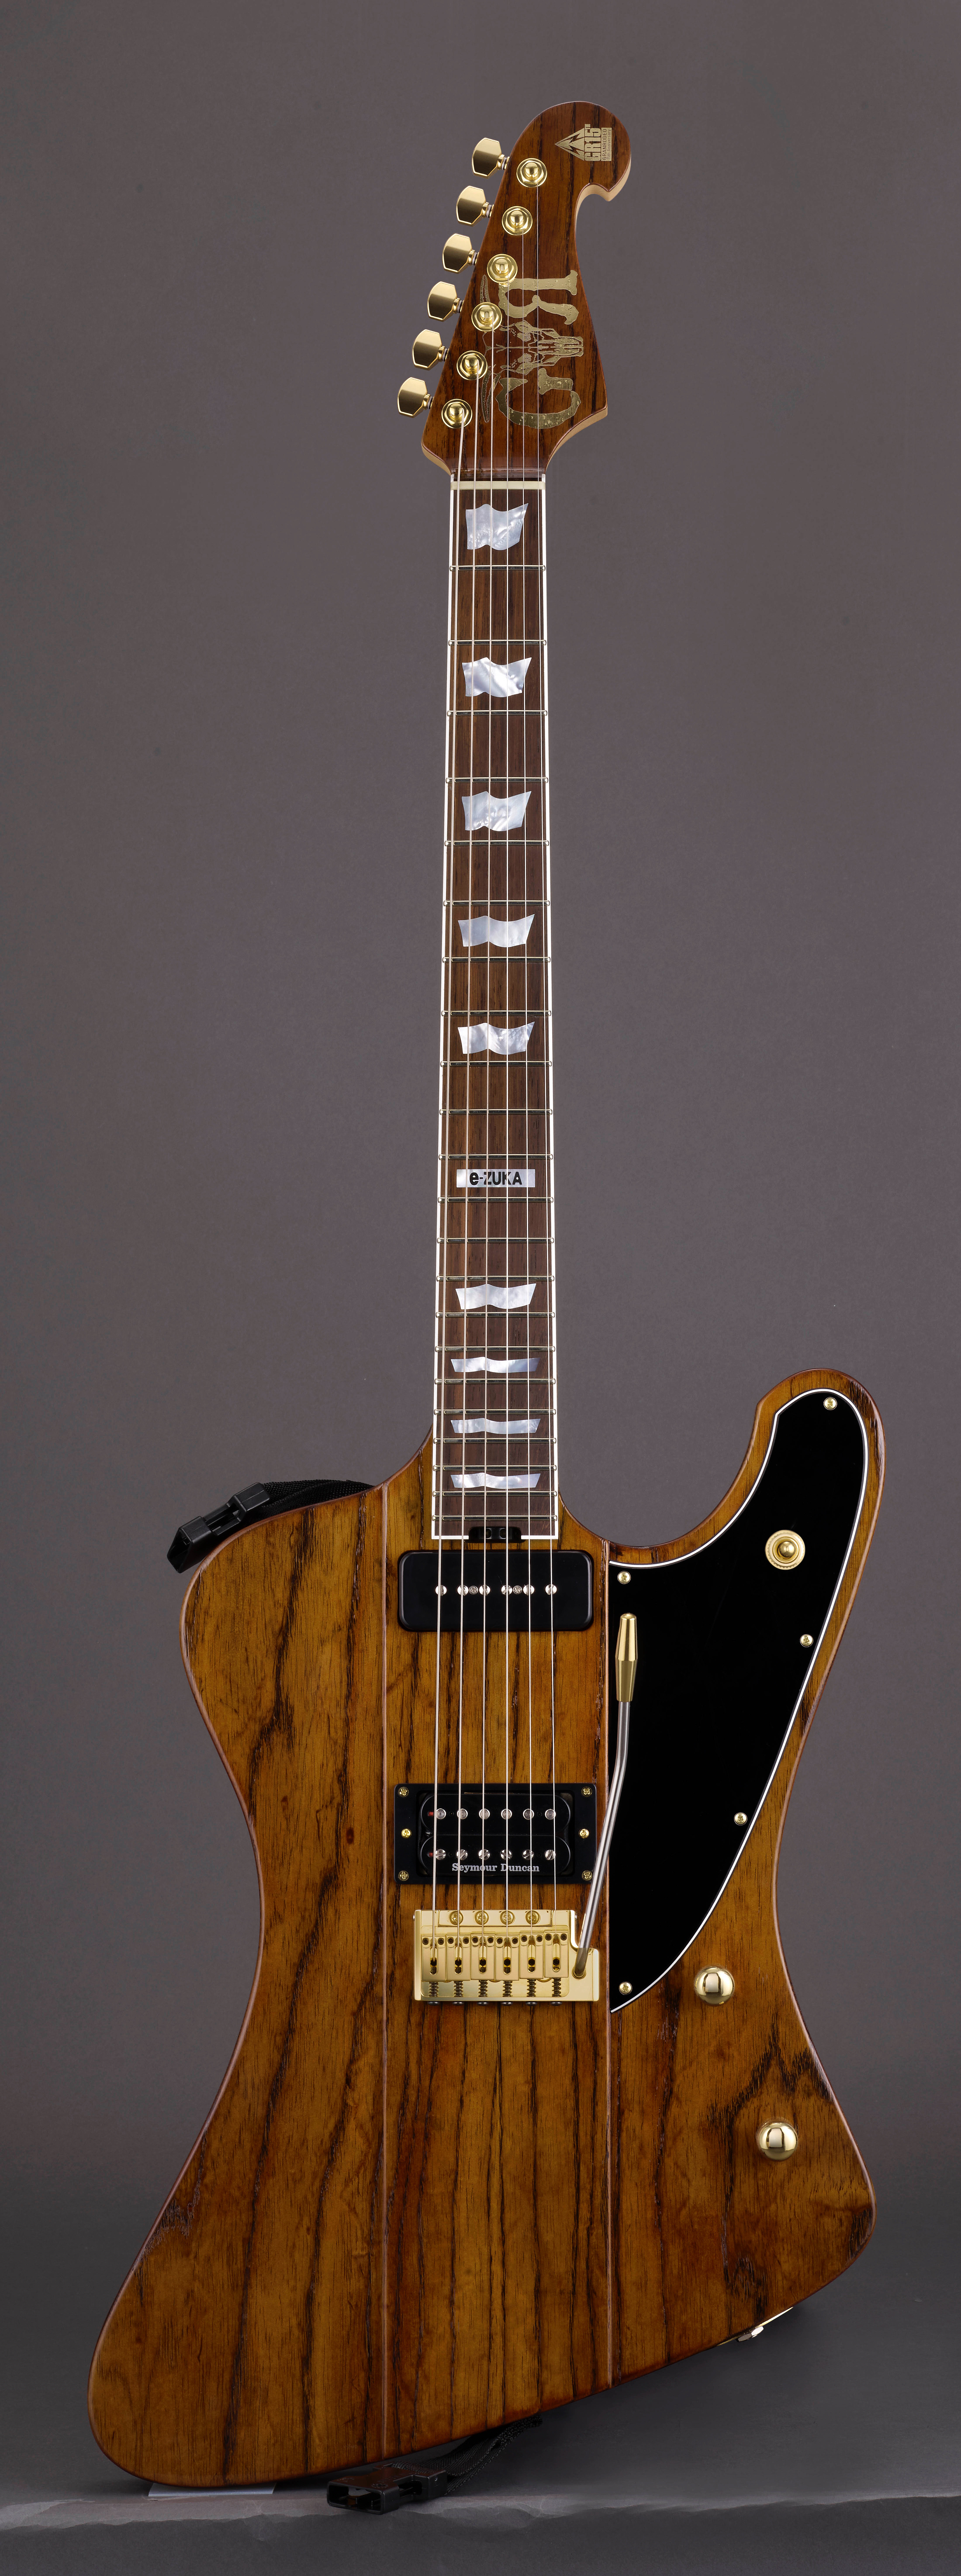 GRANRODEO 15周年記念ギター 「RODEO Phoenix」